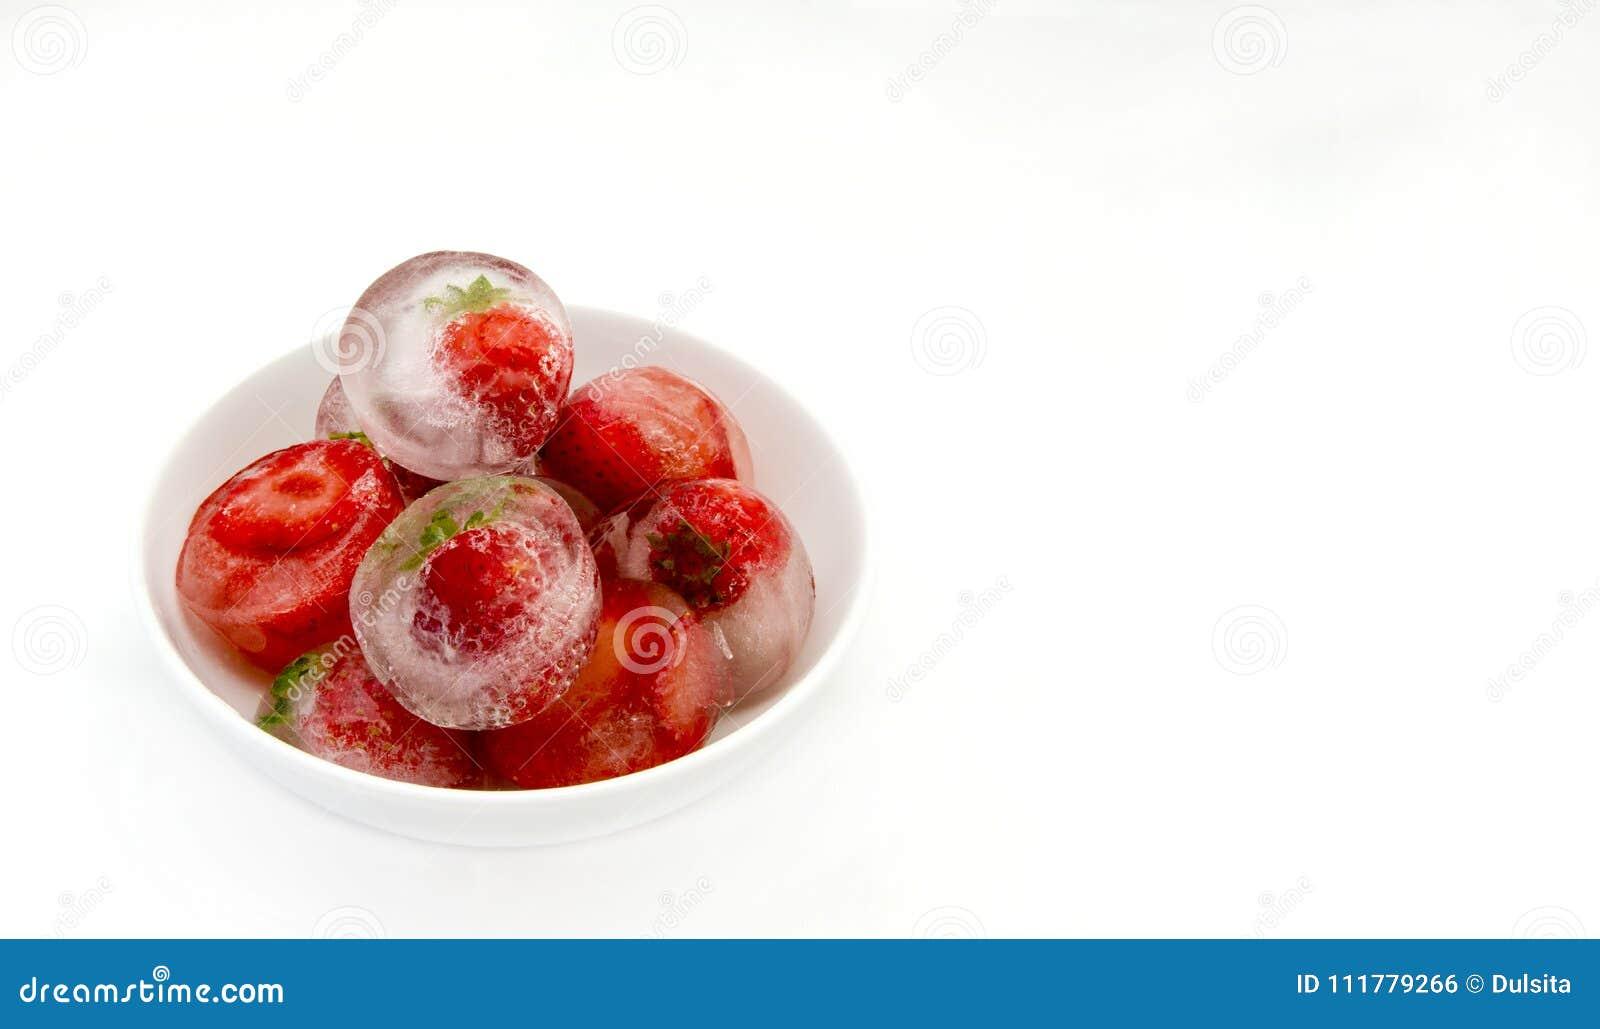 Eiswürfel mit Erdbeeren